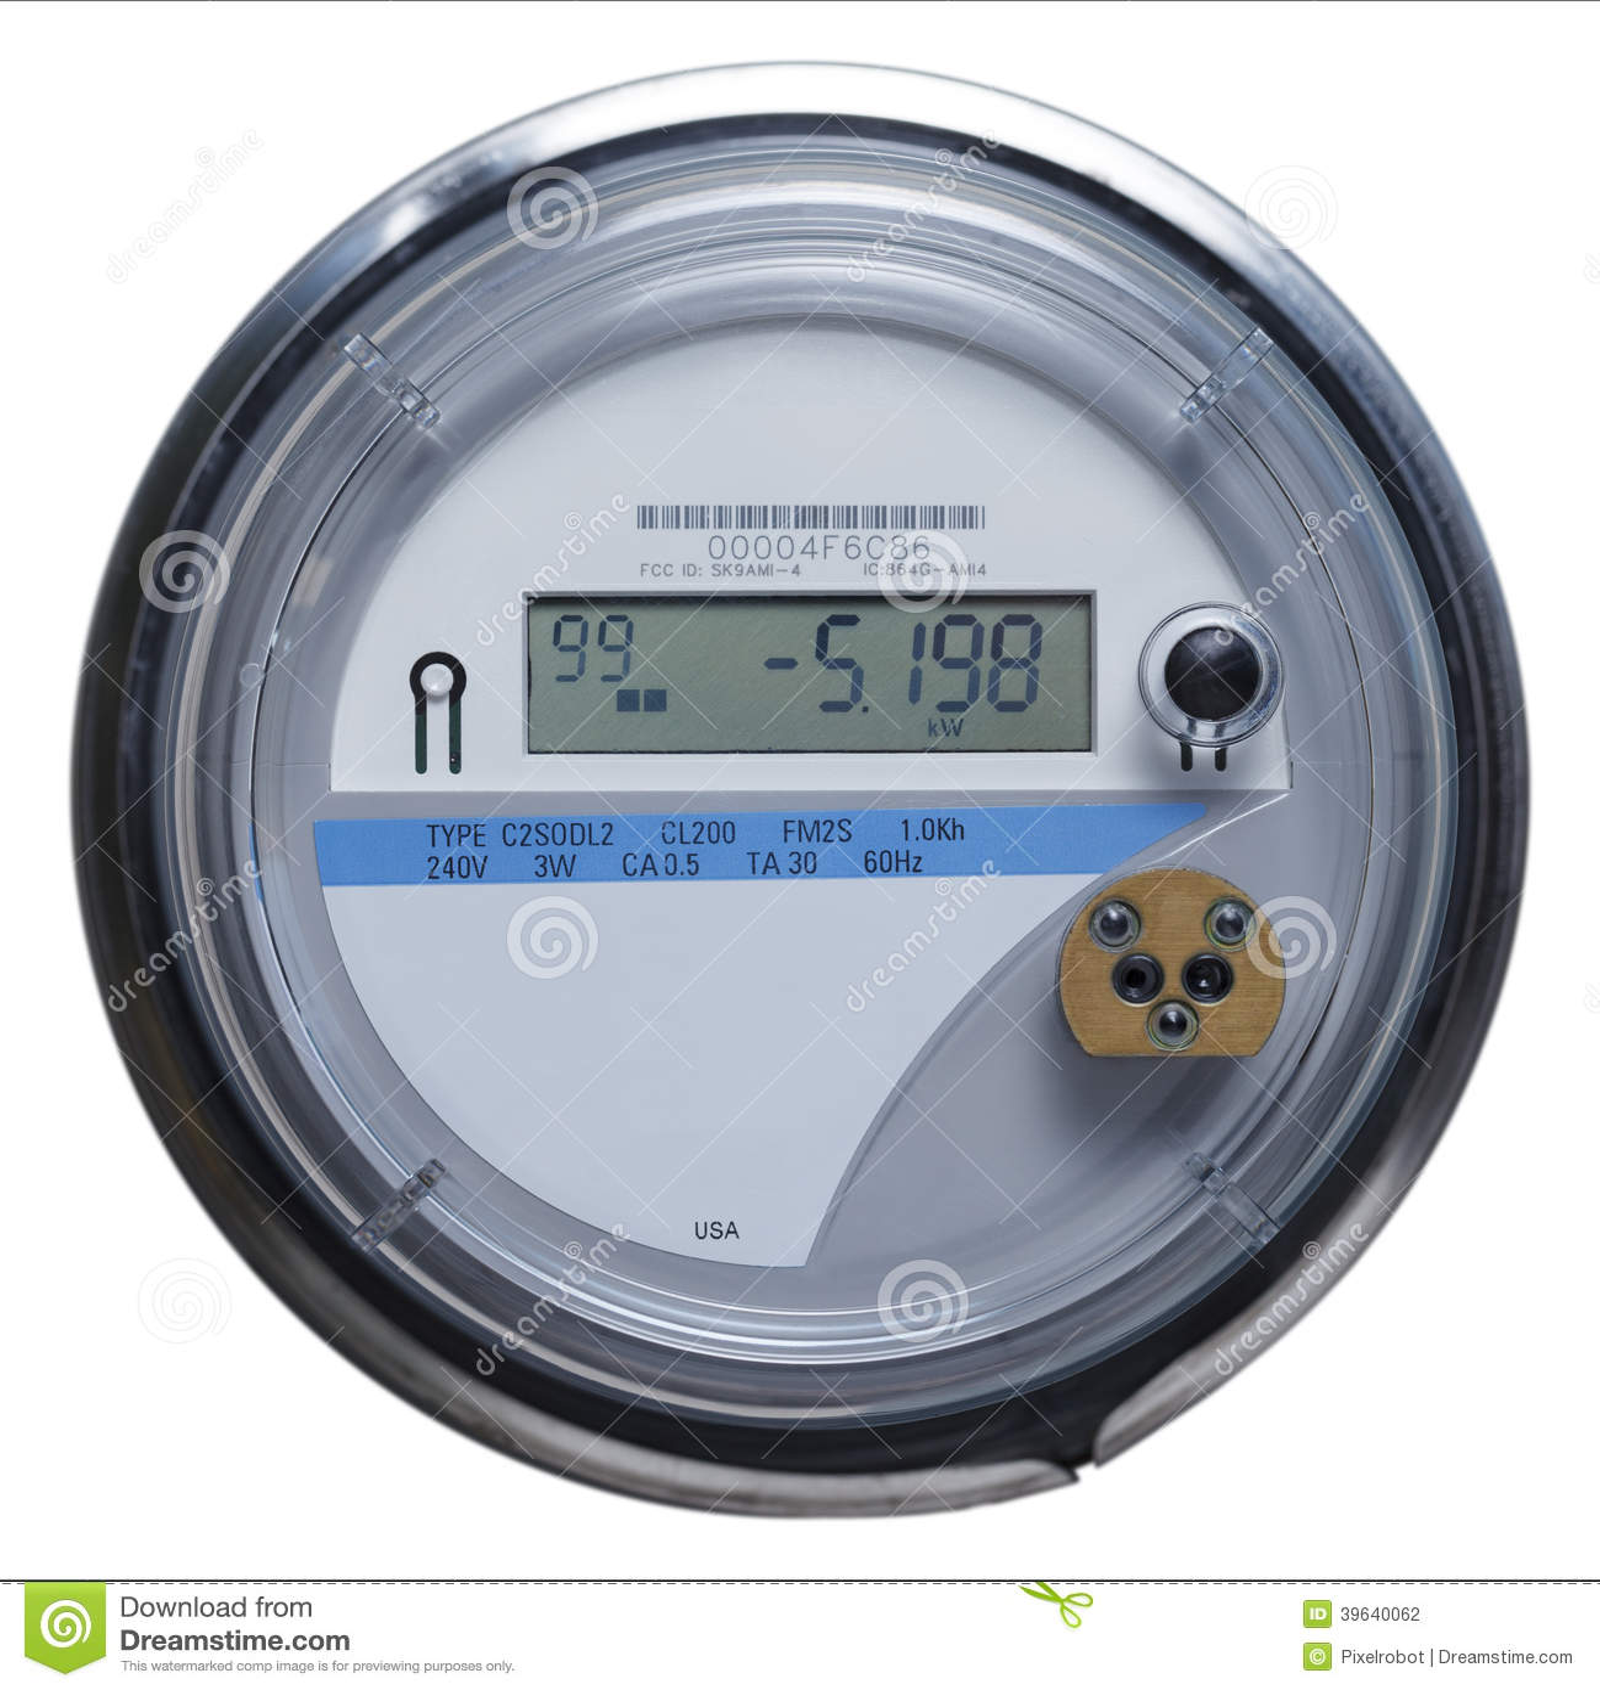 Multifunction Meter Front View : Smart meter stock photo image